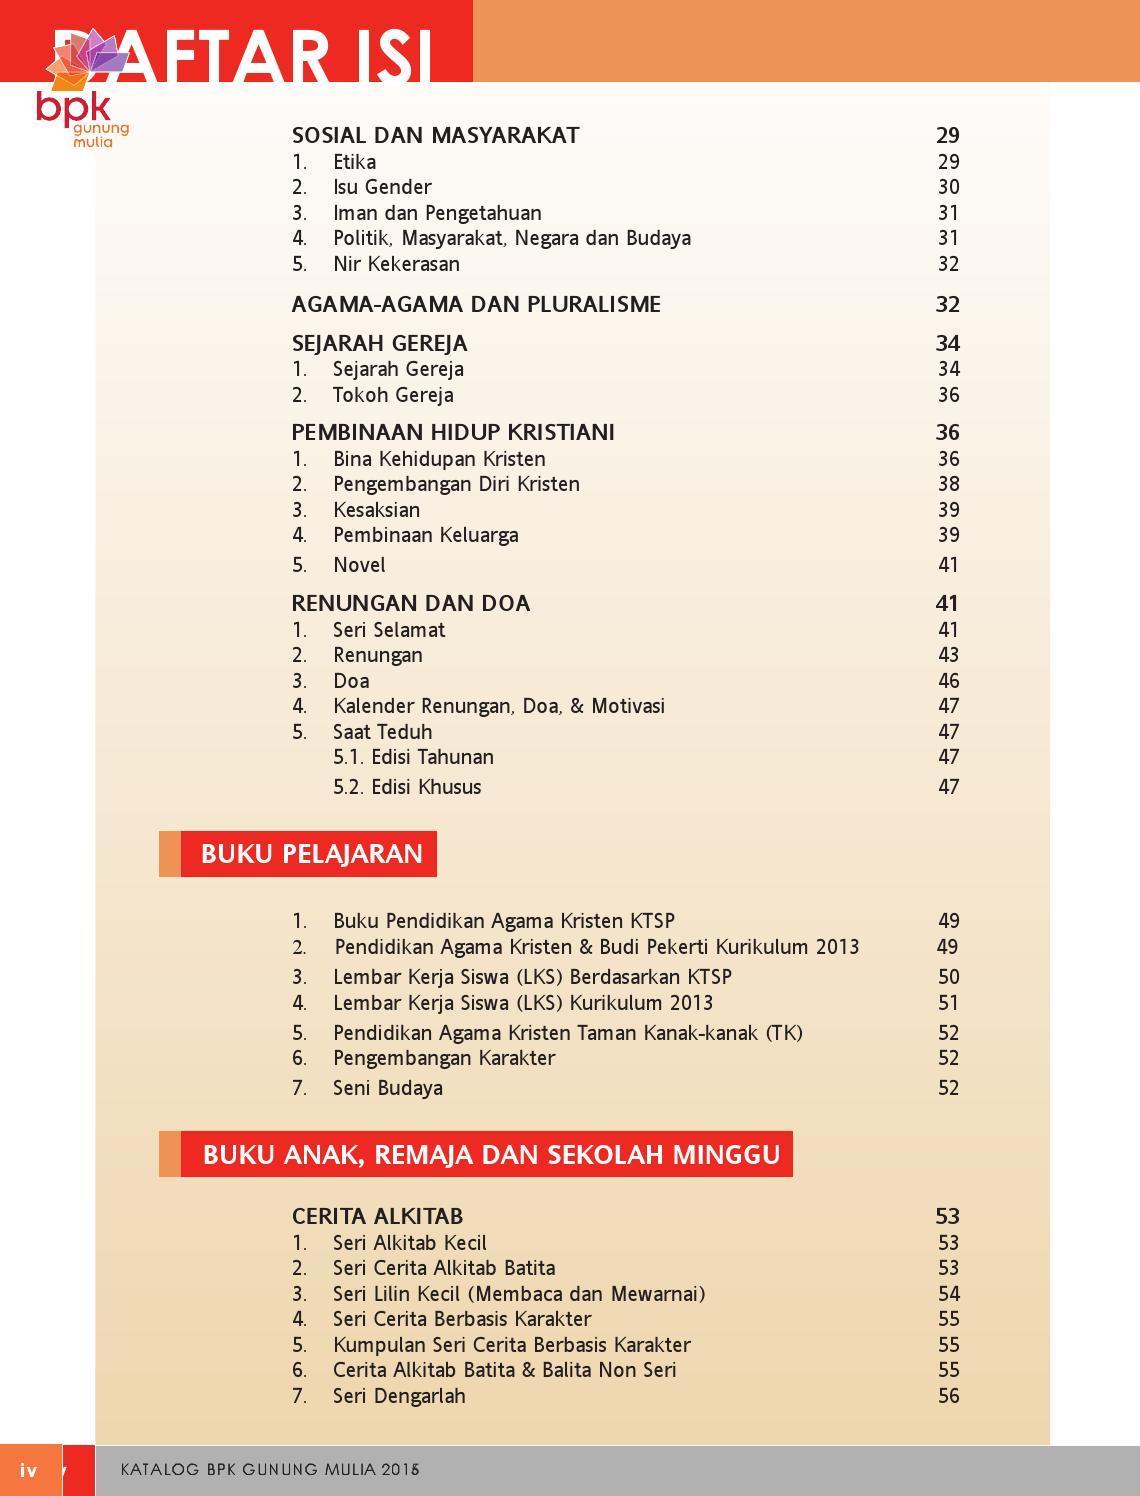 Katalog Buku BPK Gunung Mulia 2016 By PT BPK Gunung Mulia